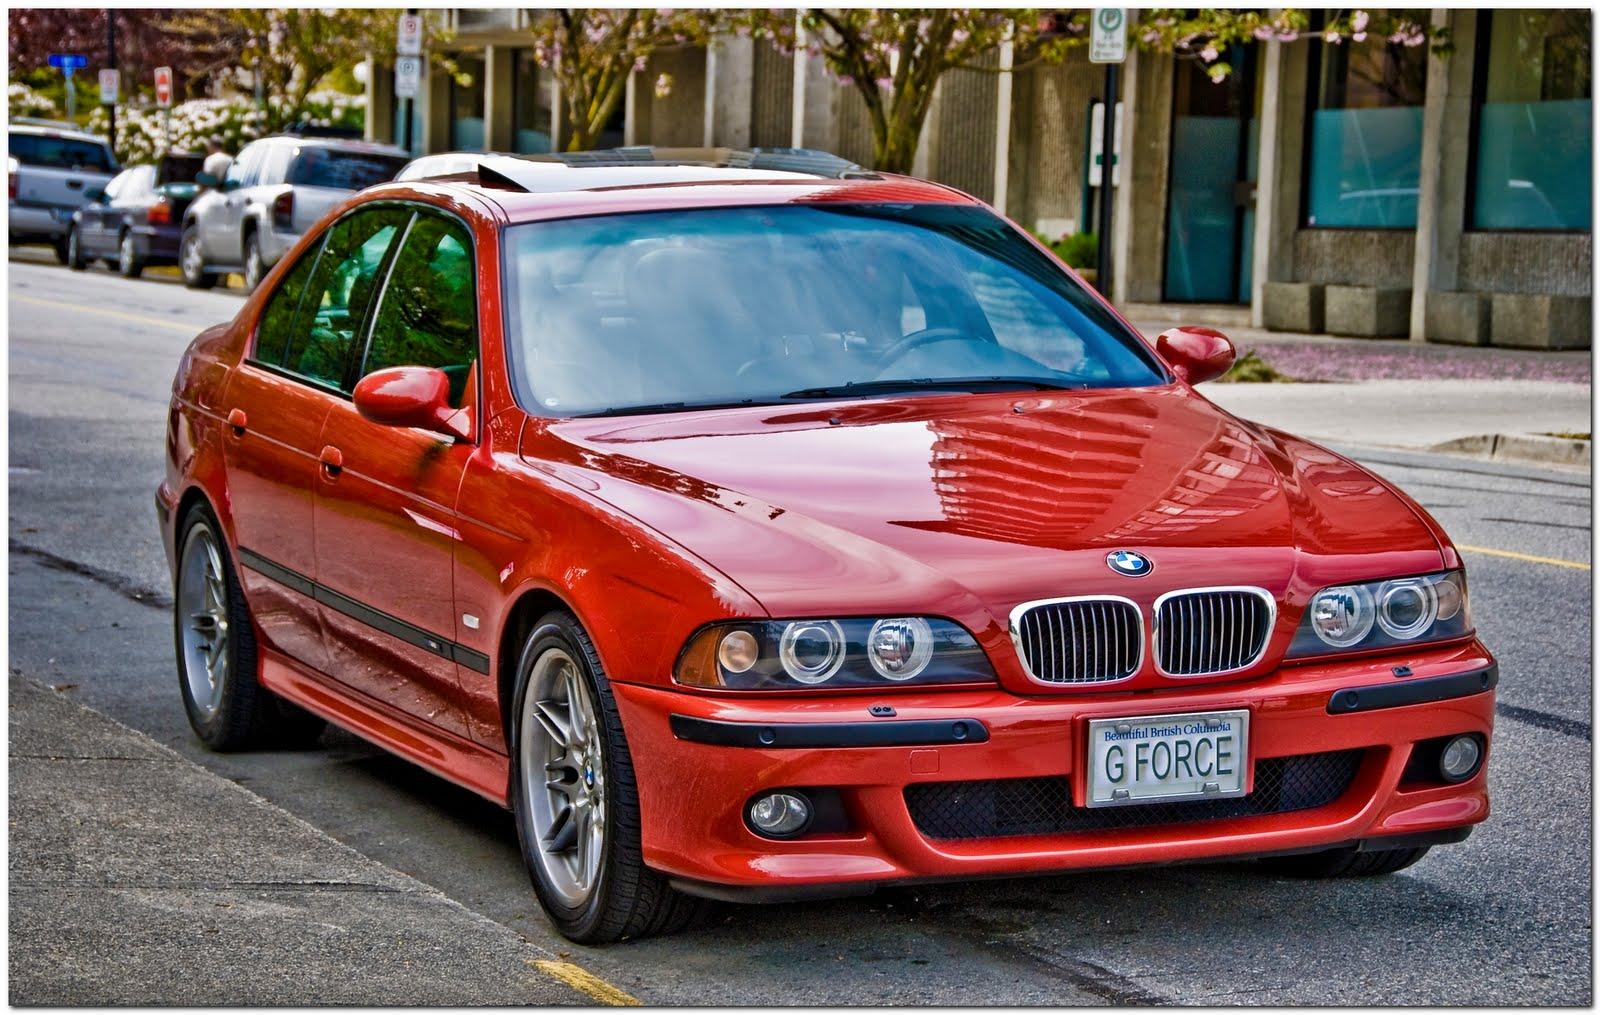 http://4.bp.blogspot.com/-C0uC4j-K-JA/Tm_P2dUkTaI/AAAAAAAAEXw/Cy5laAwZkrM/s1600/BMW-E39-M5-Business-Car+%25283%2529.jpg